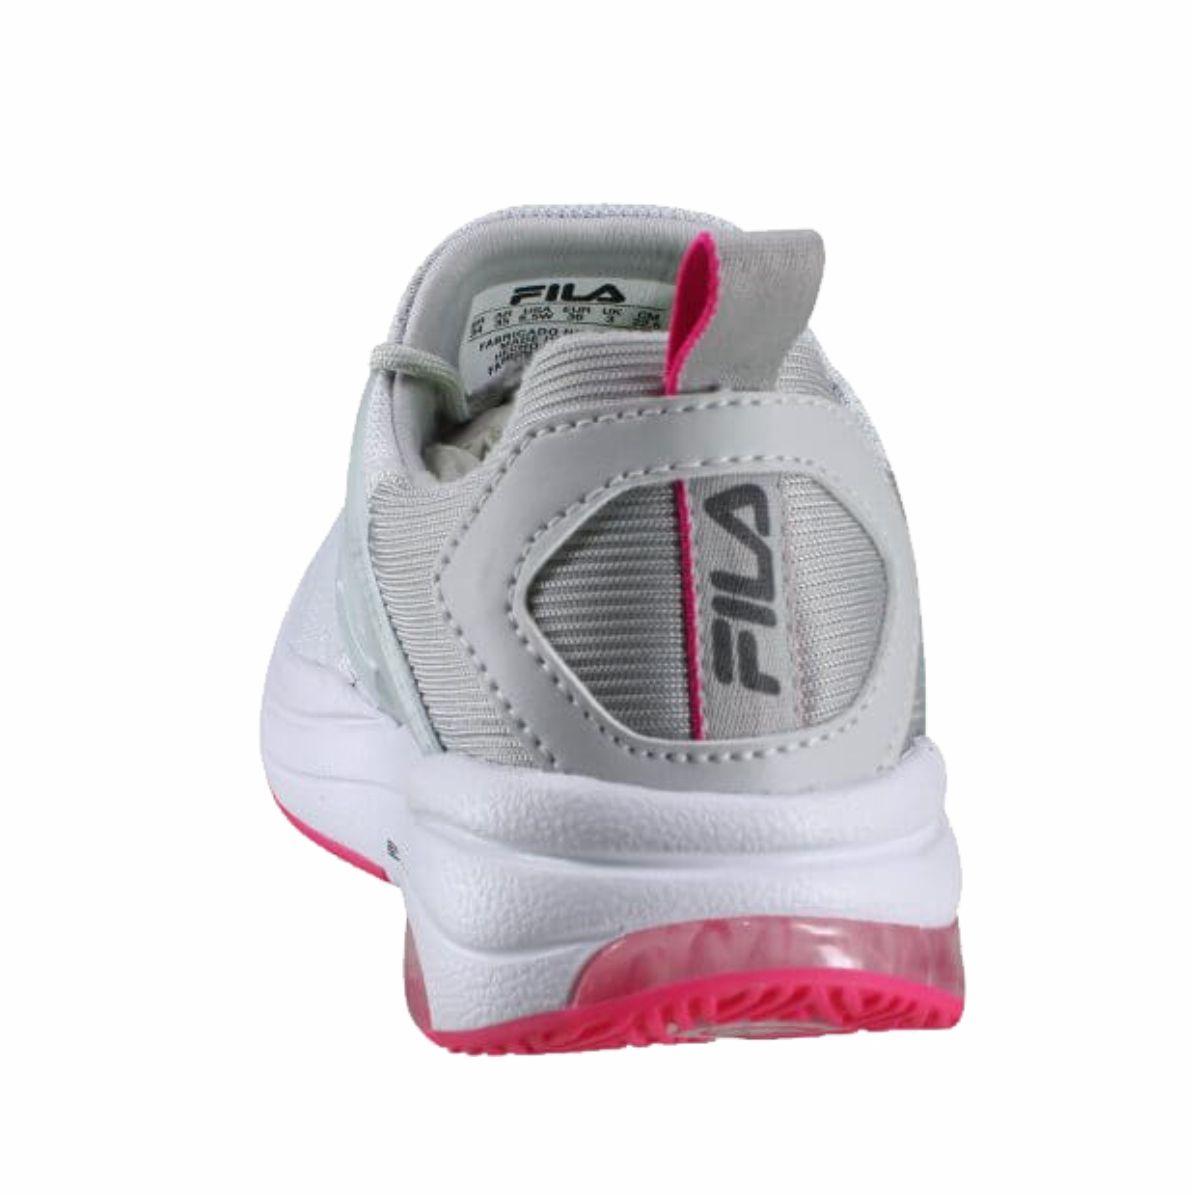 Tenis Fila Thunderbolt Training Academia Feminino Cinza